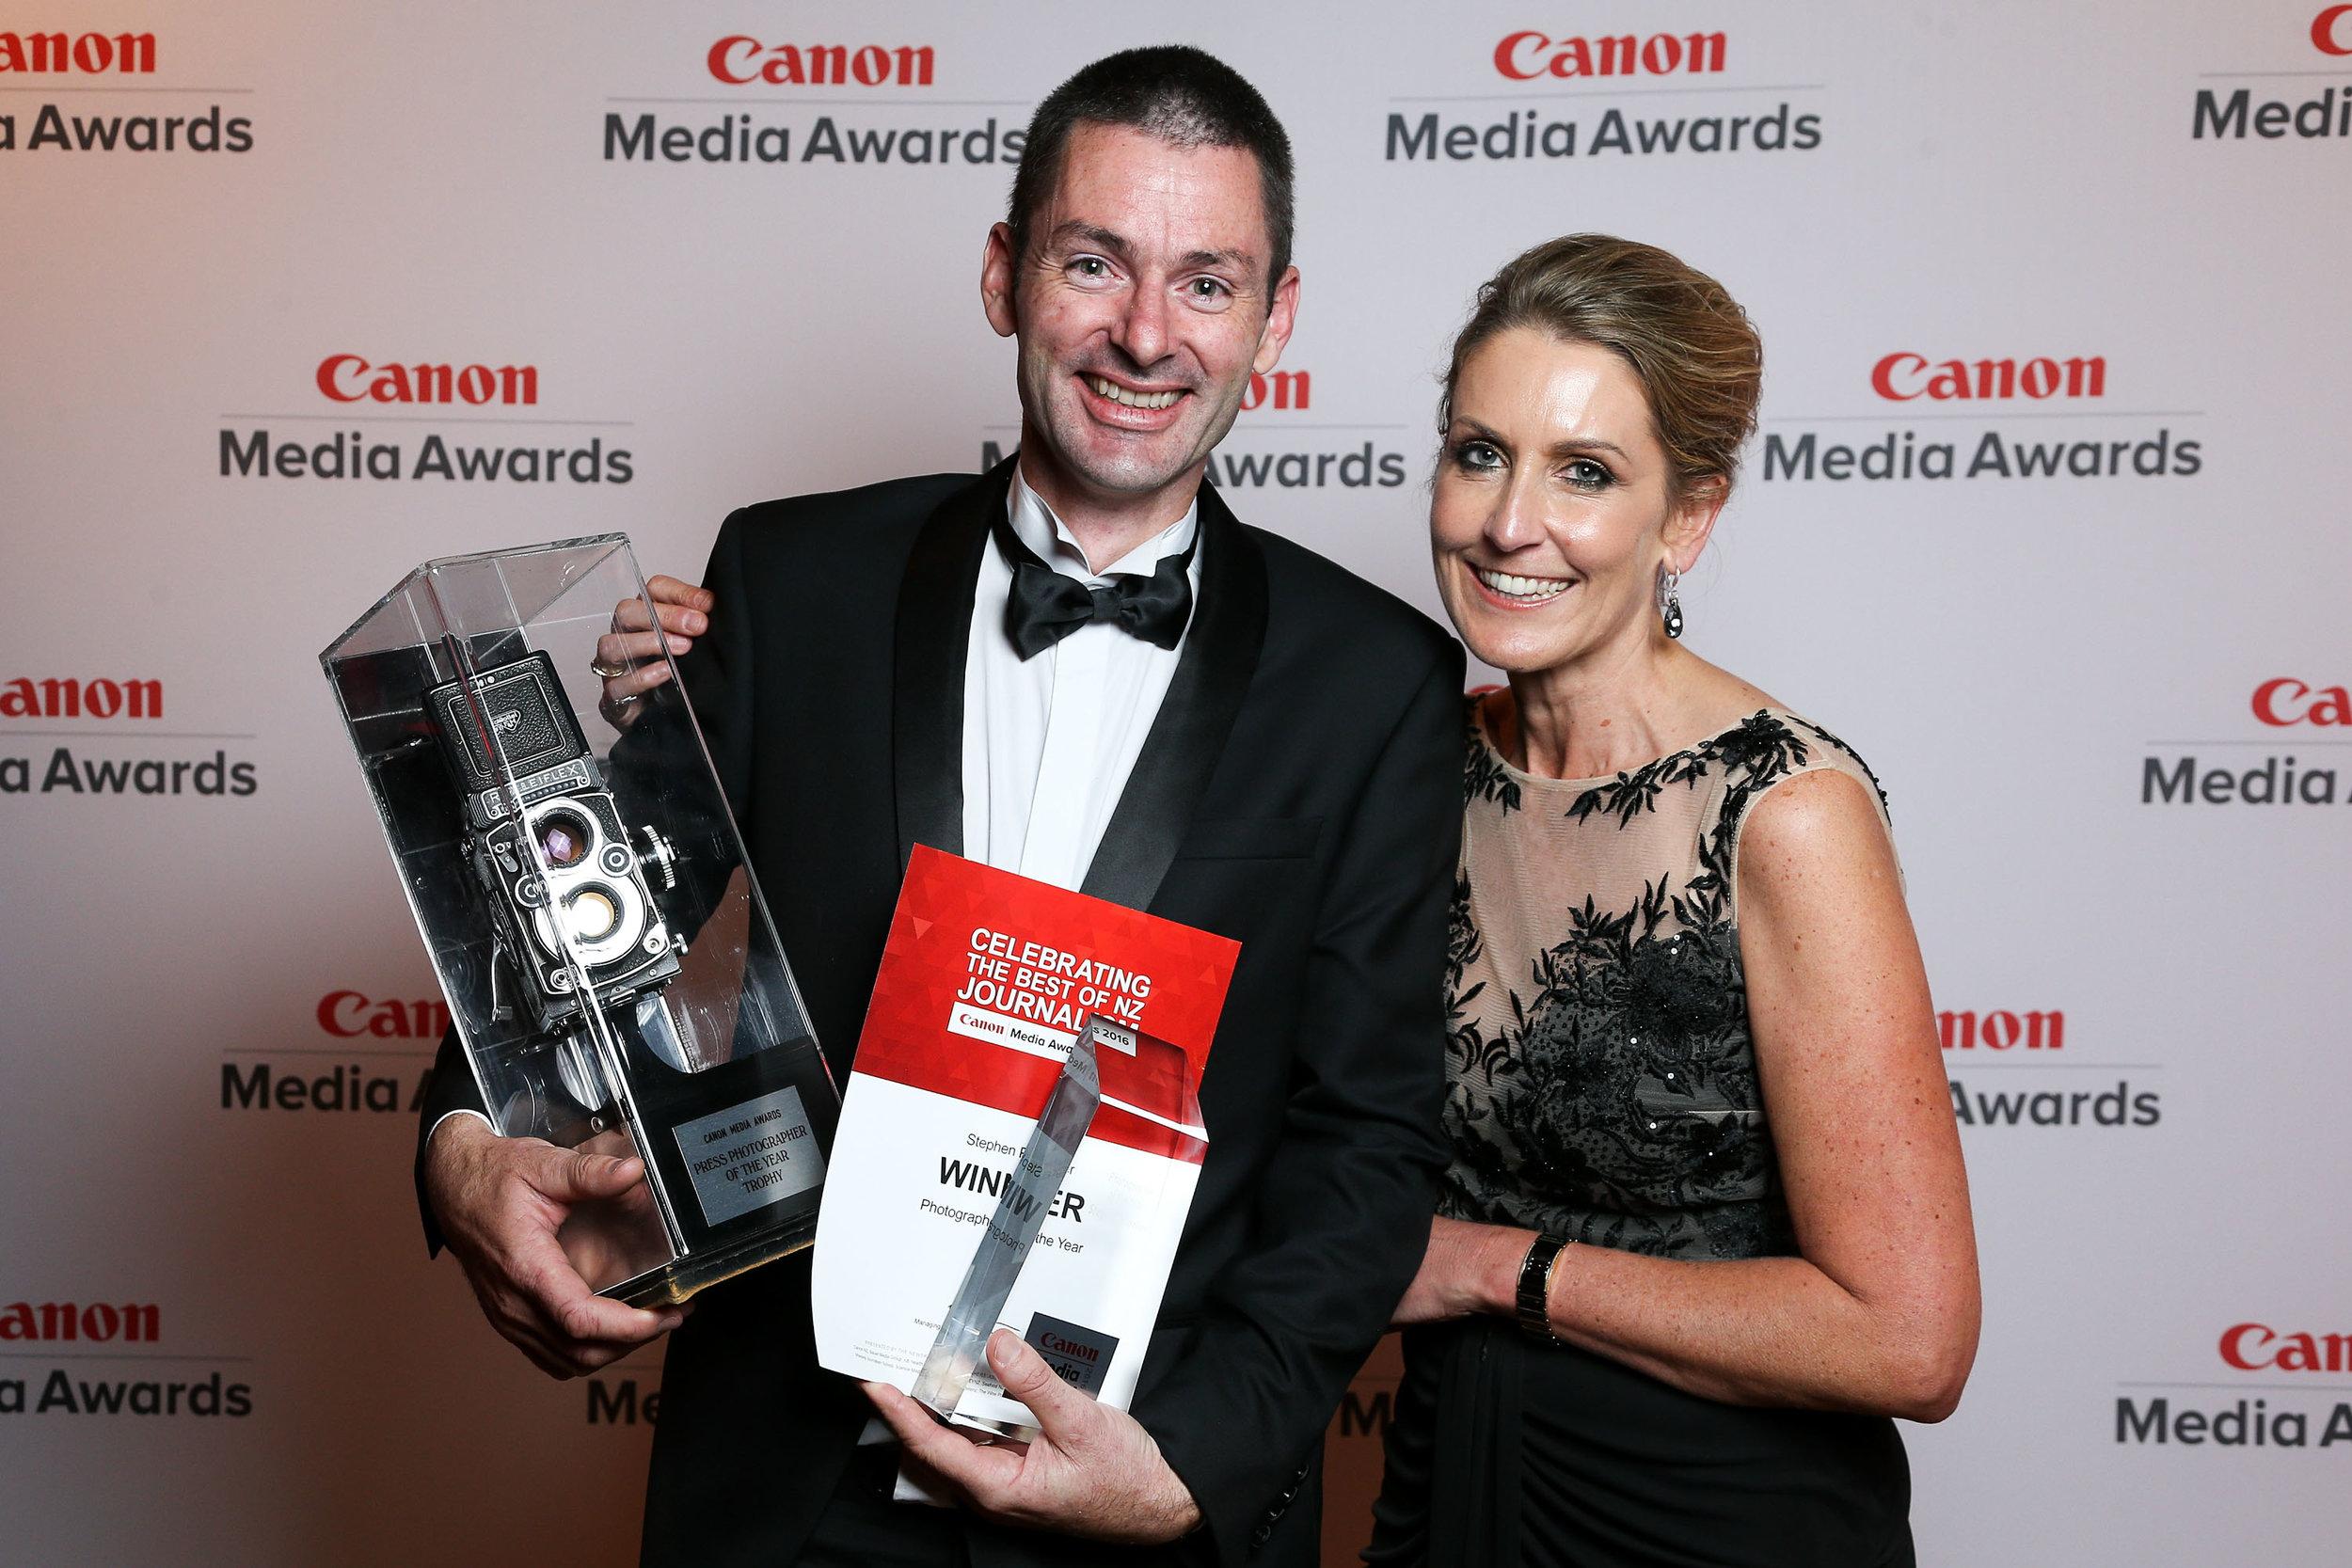 160520_Canon_Media_Awards_30.JPG